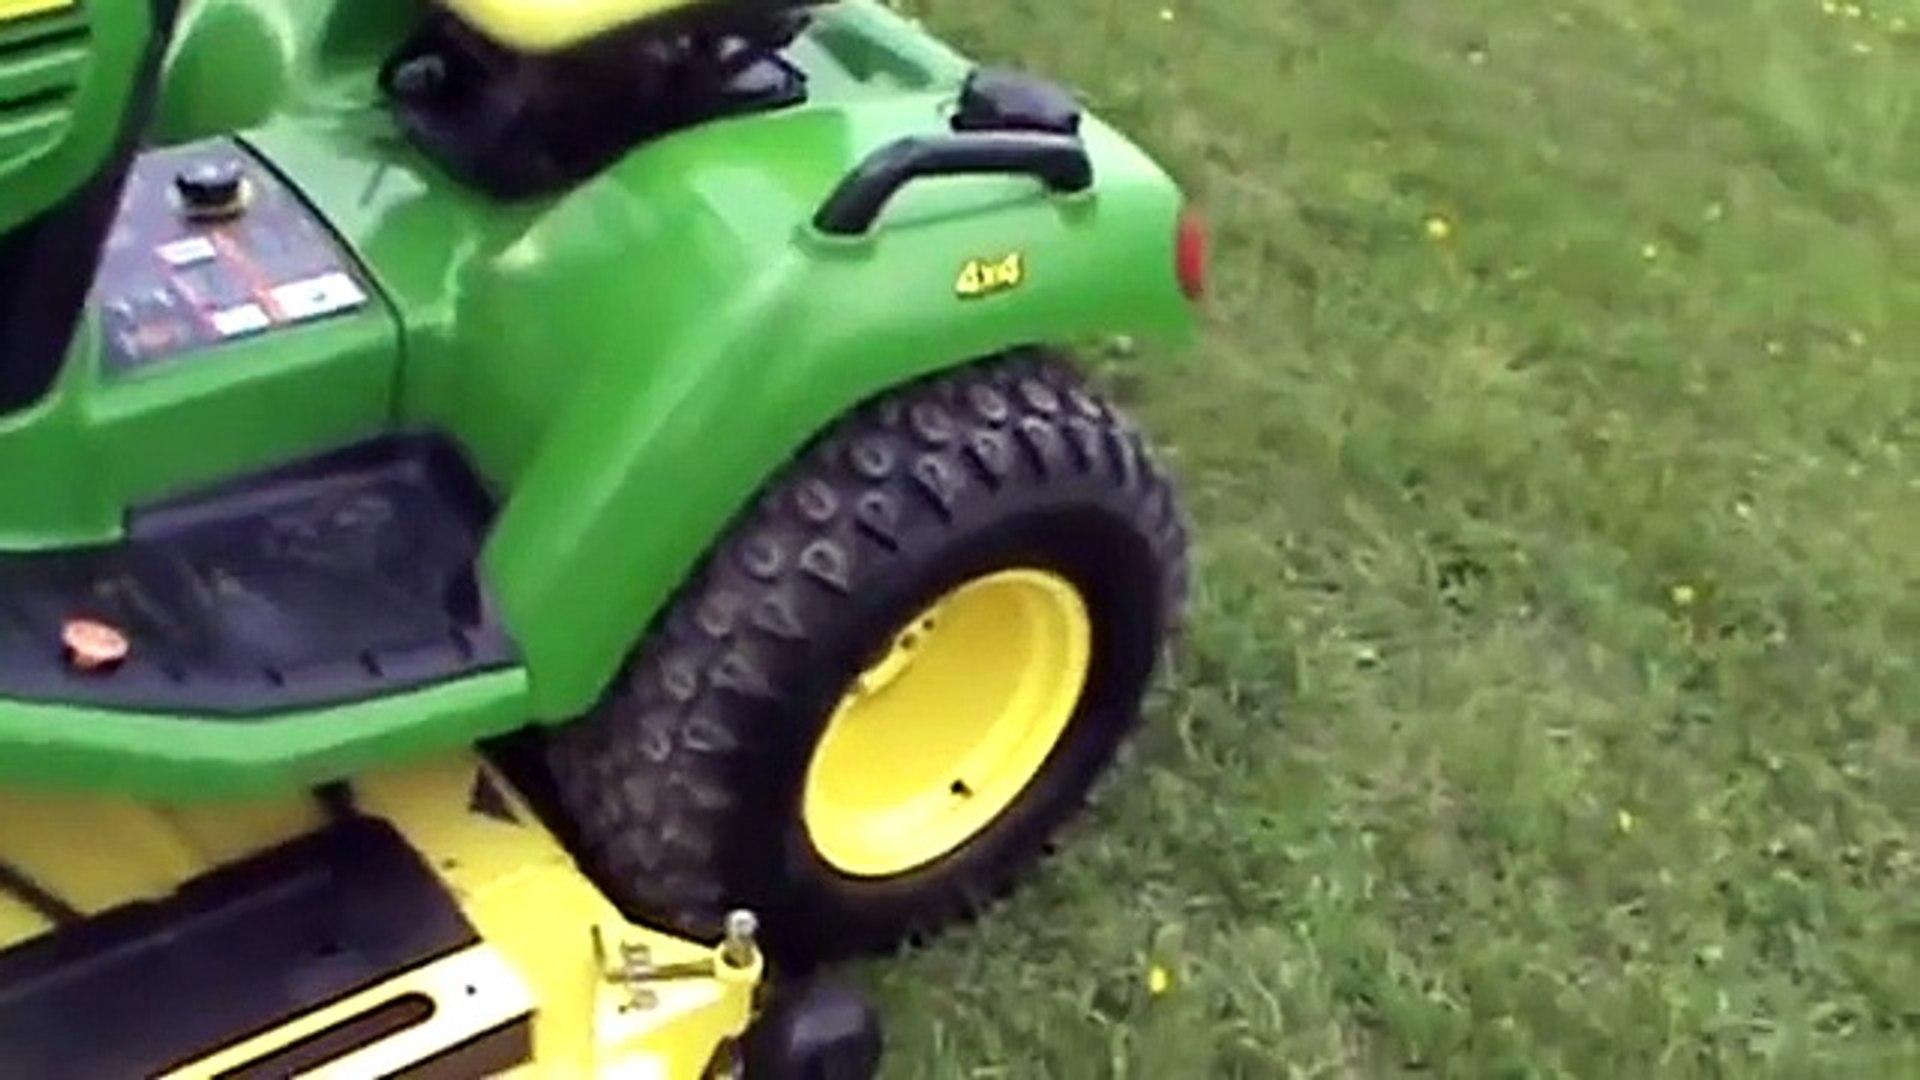 NEW ALTERNATOR PERMANENT MAGNET for John Deere Lawn Tractor